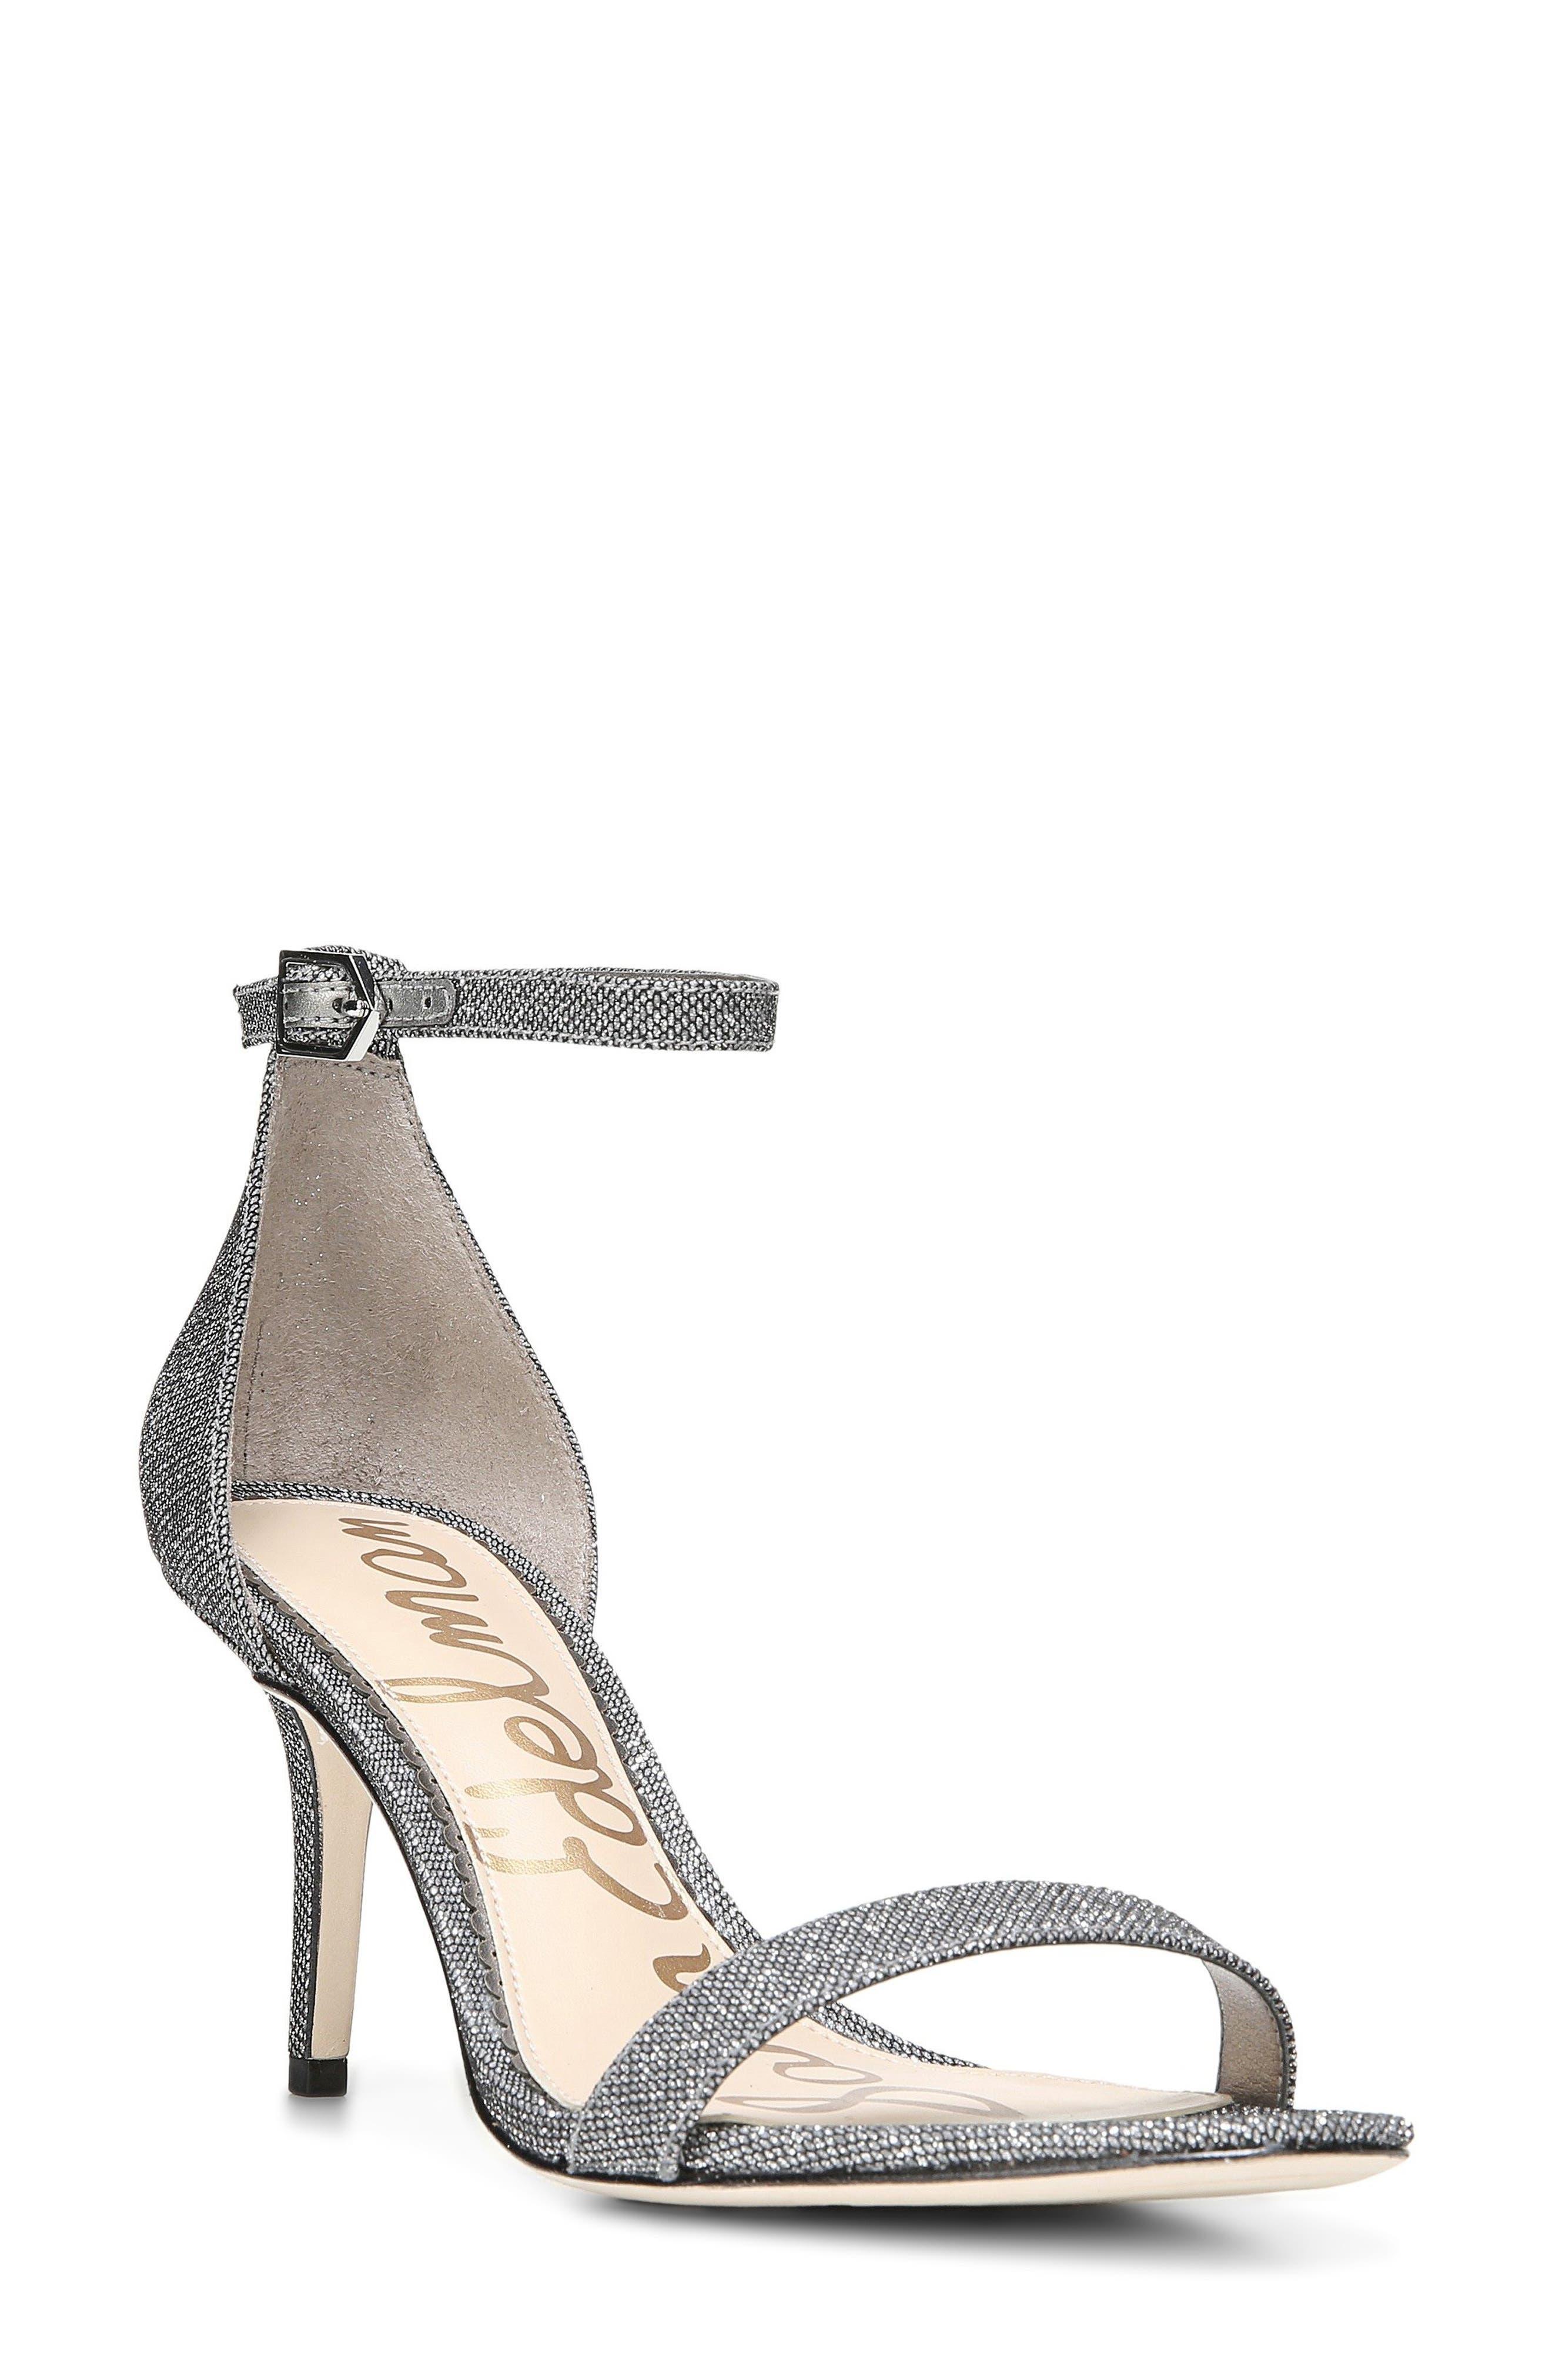 Patti Ankle Strap Sandal,                             Main thumbnail 1, color,                             Pewter Fabric